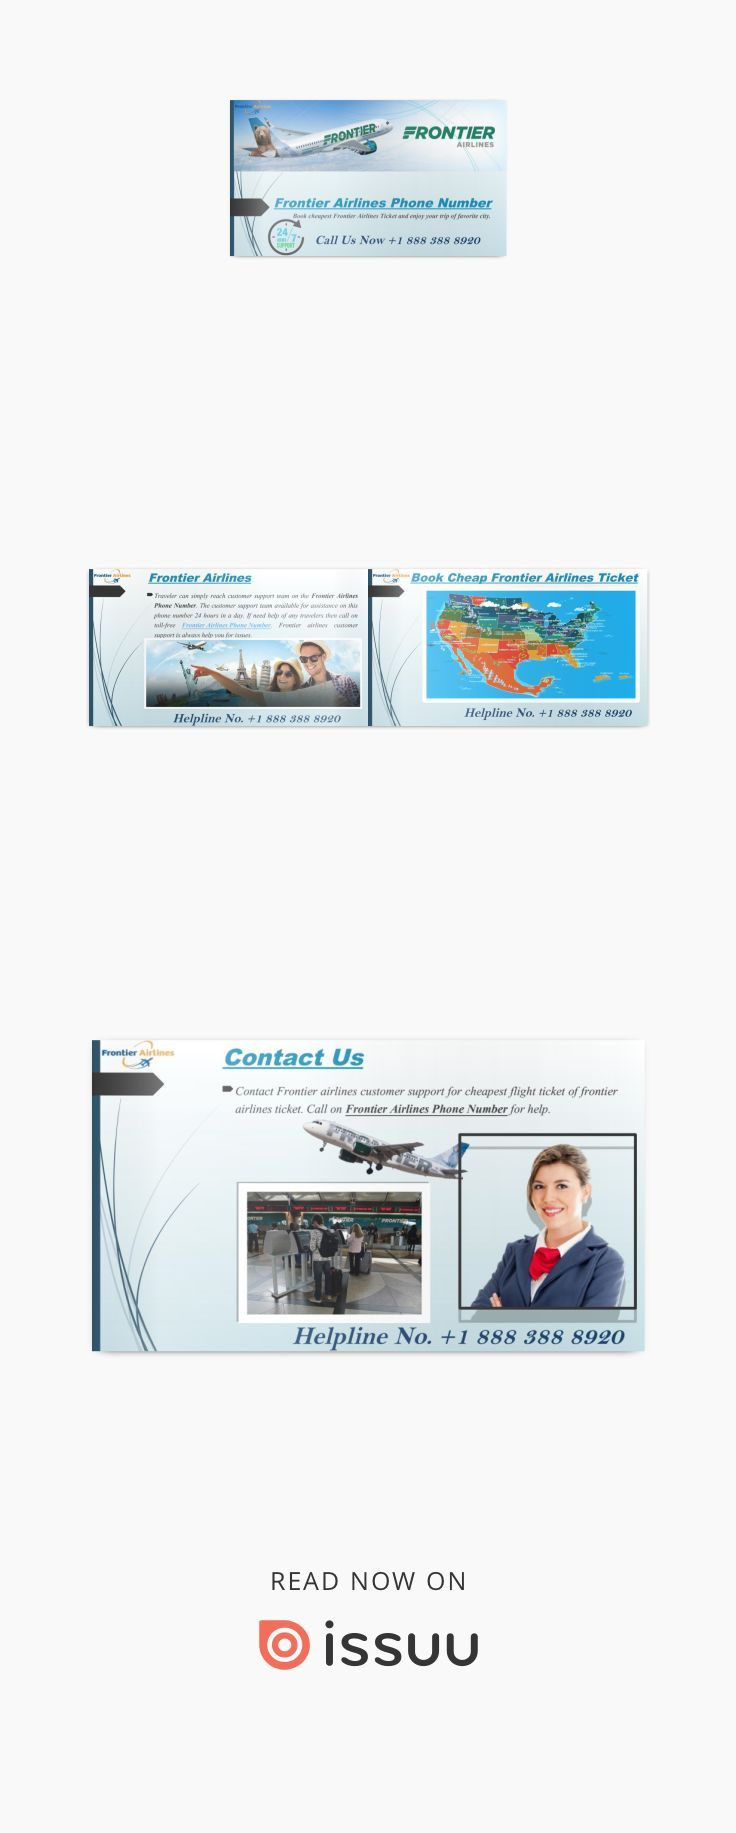 Get Help Via Frontier Airlines Phone Number For Flights Booking Booking Flights Phone Numbers Airlines